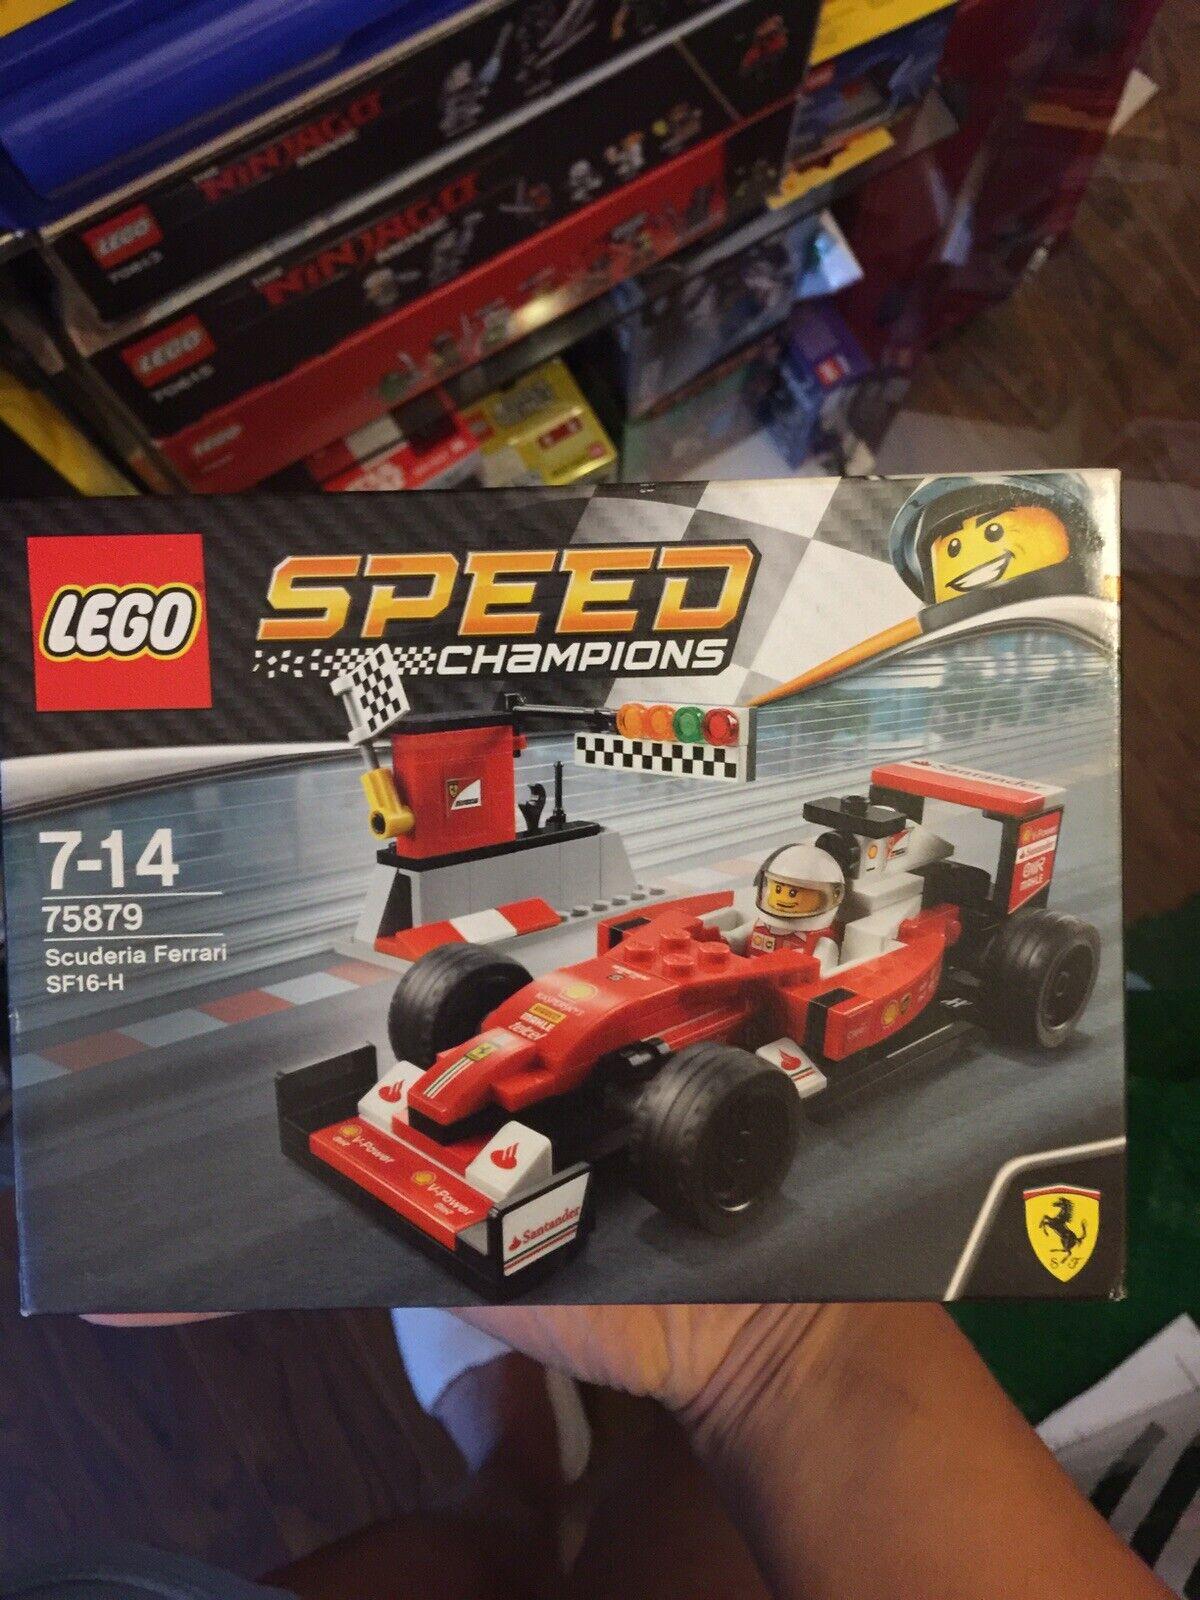 Lego Lego Lego speed champions Scuderia Ferrari 75879 New bfe569